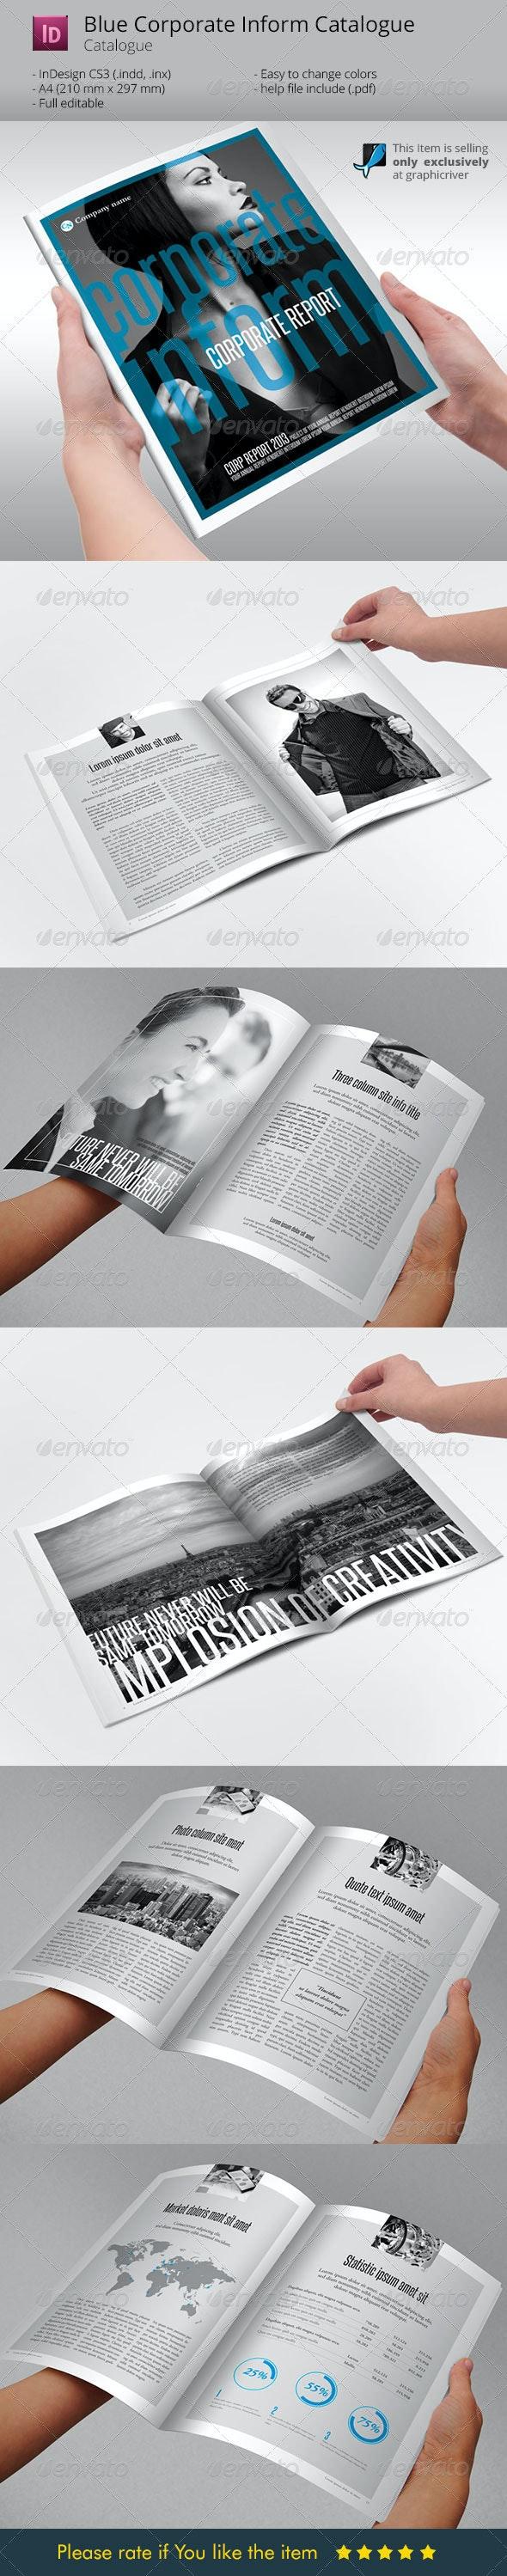 Blue Corporate Inform Indesign Template - Corporate Brochures